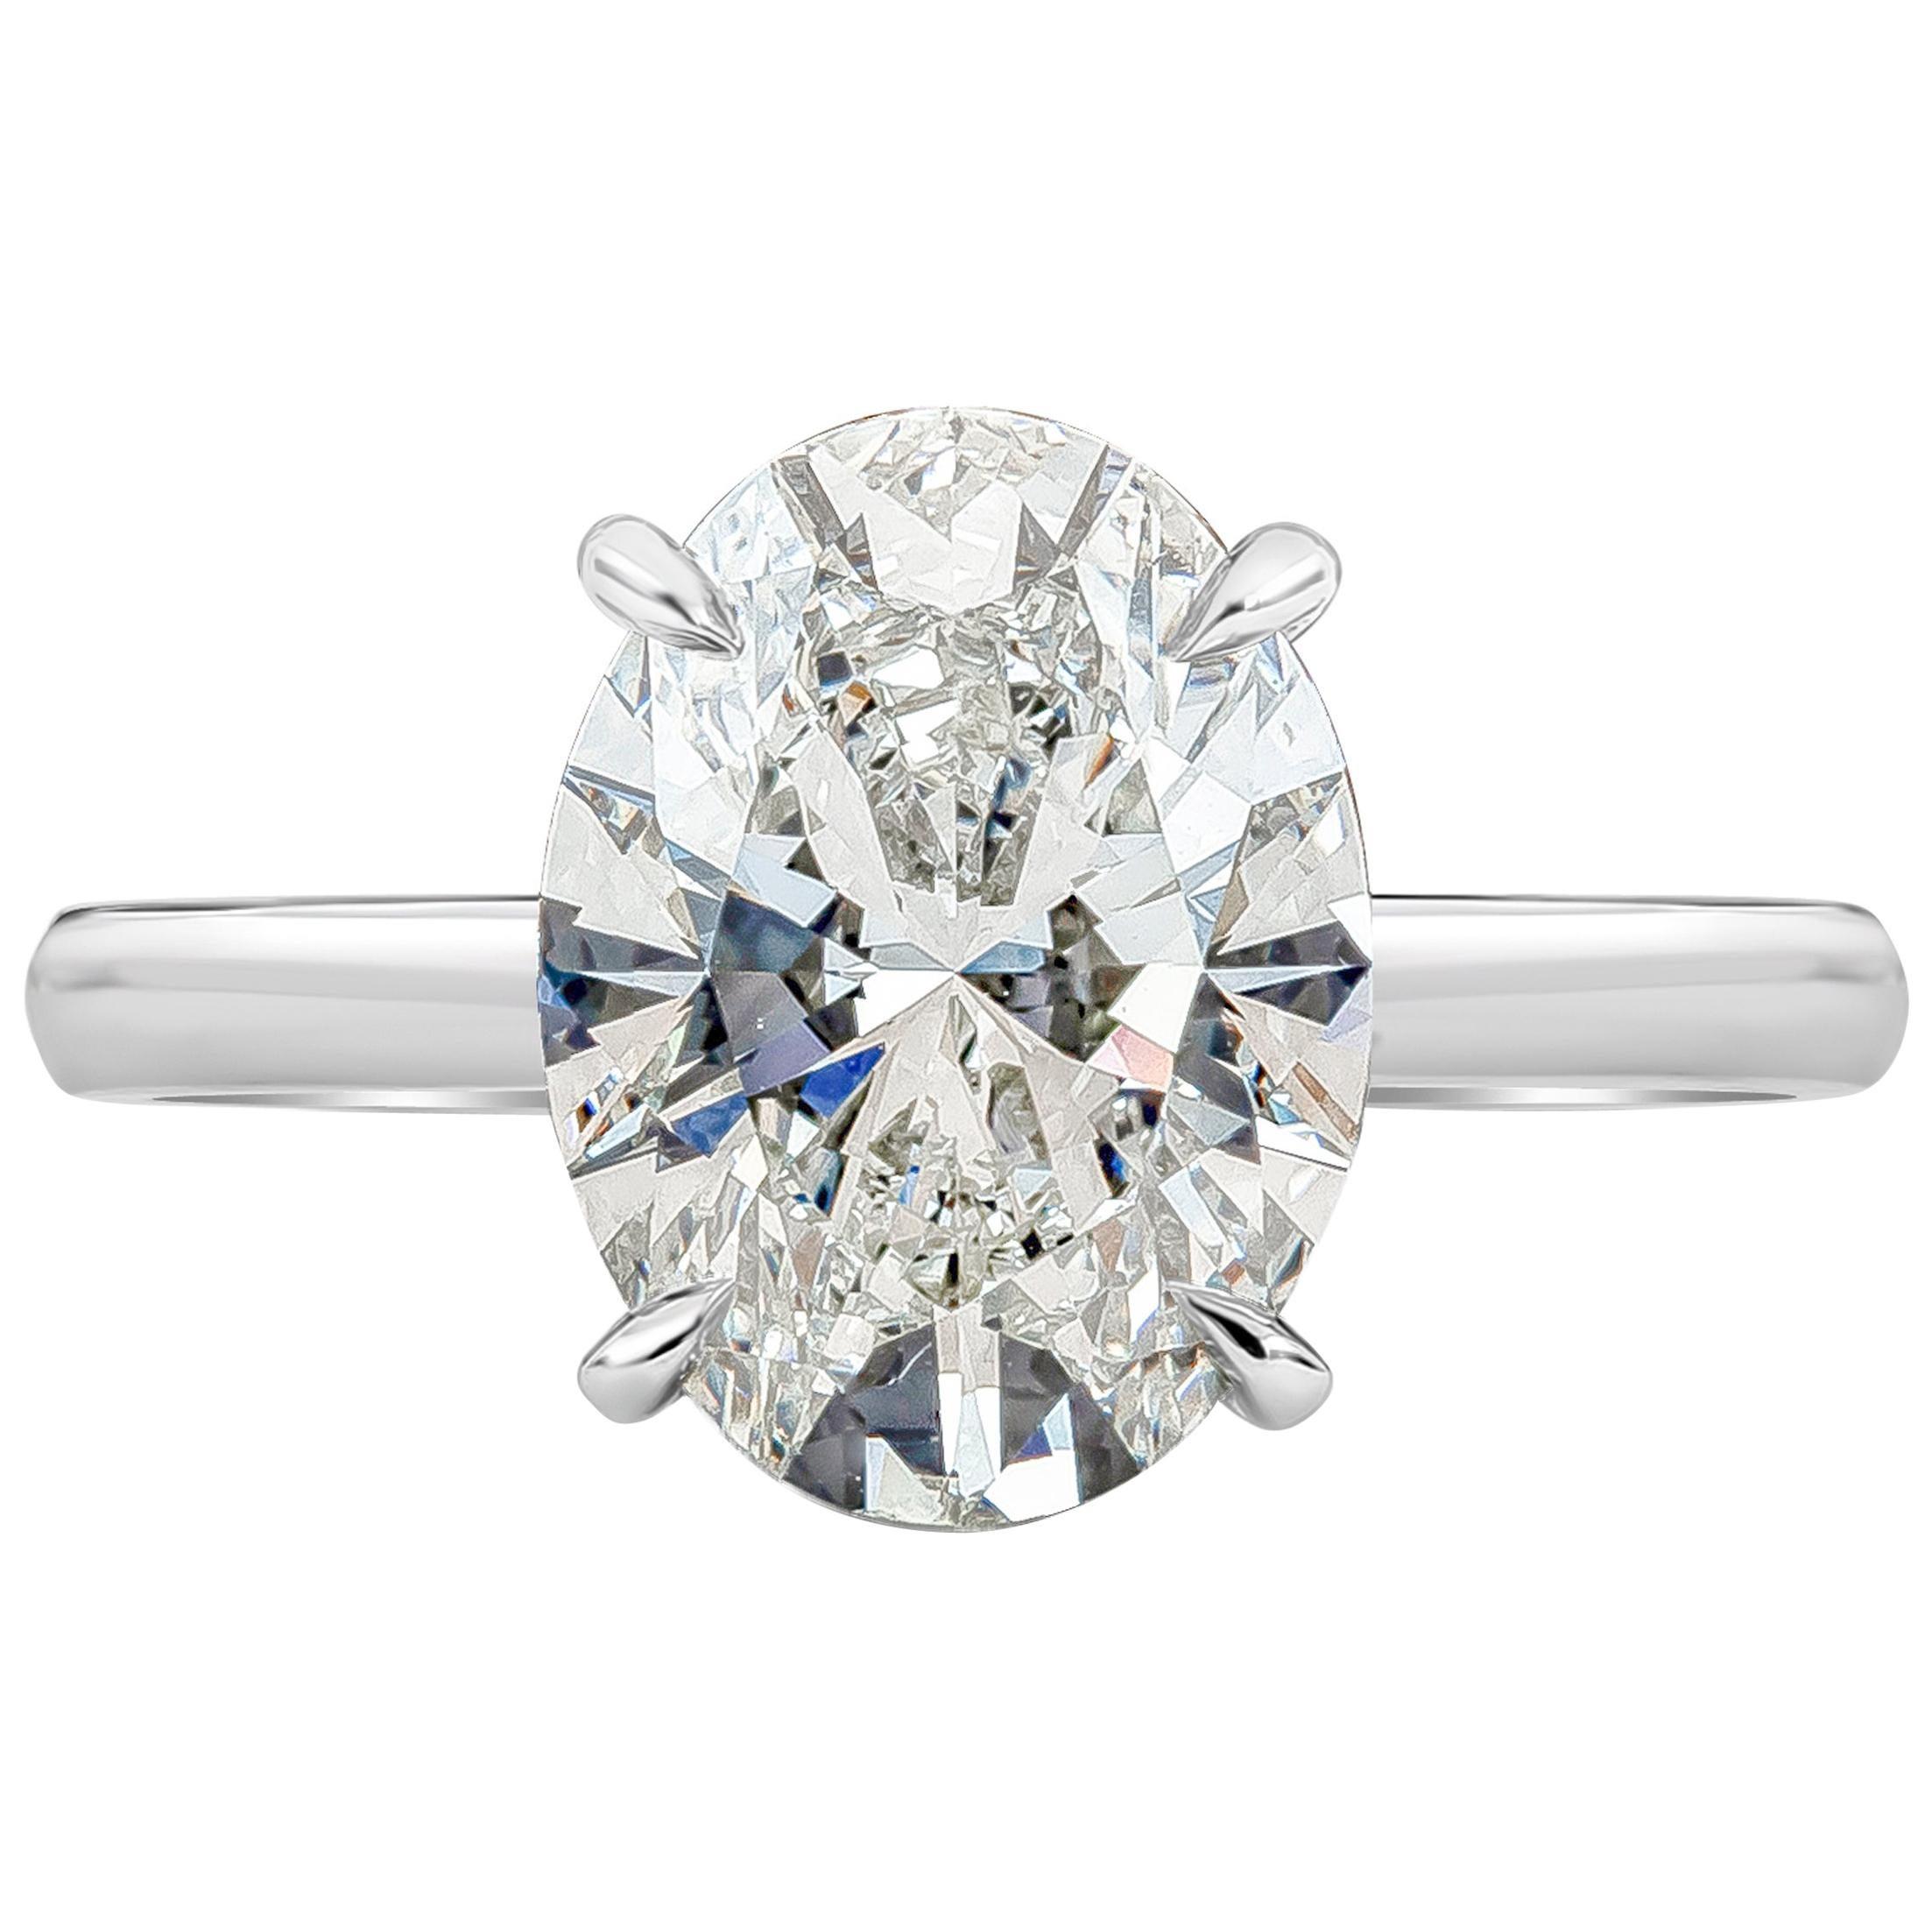 Roman Malakov GIA Certified 3.50 Carat Oval Cut Diamond Engagement Ring